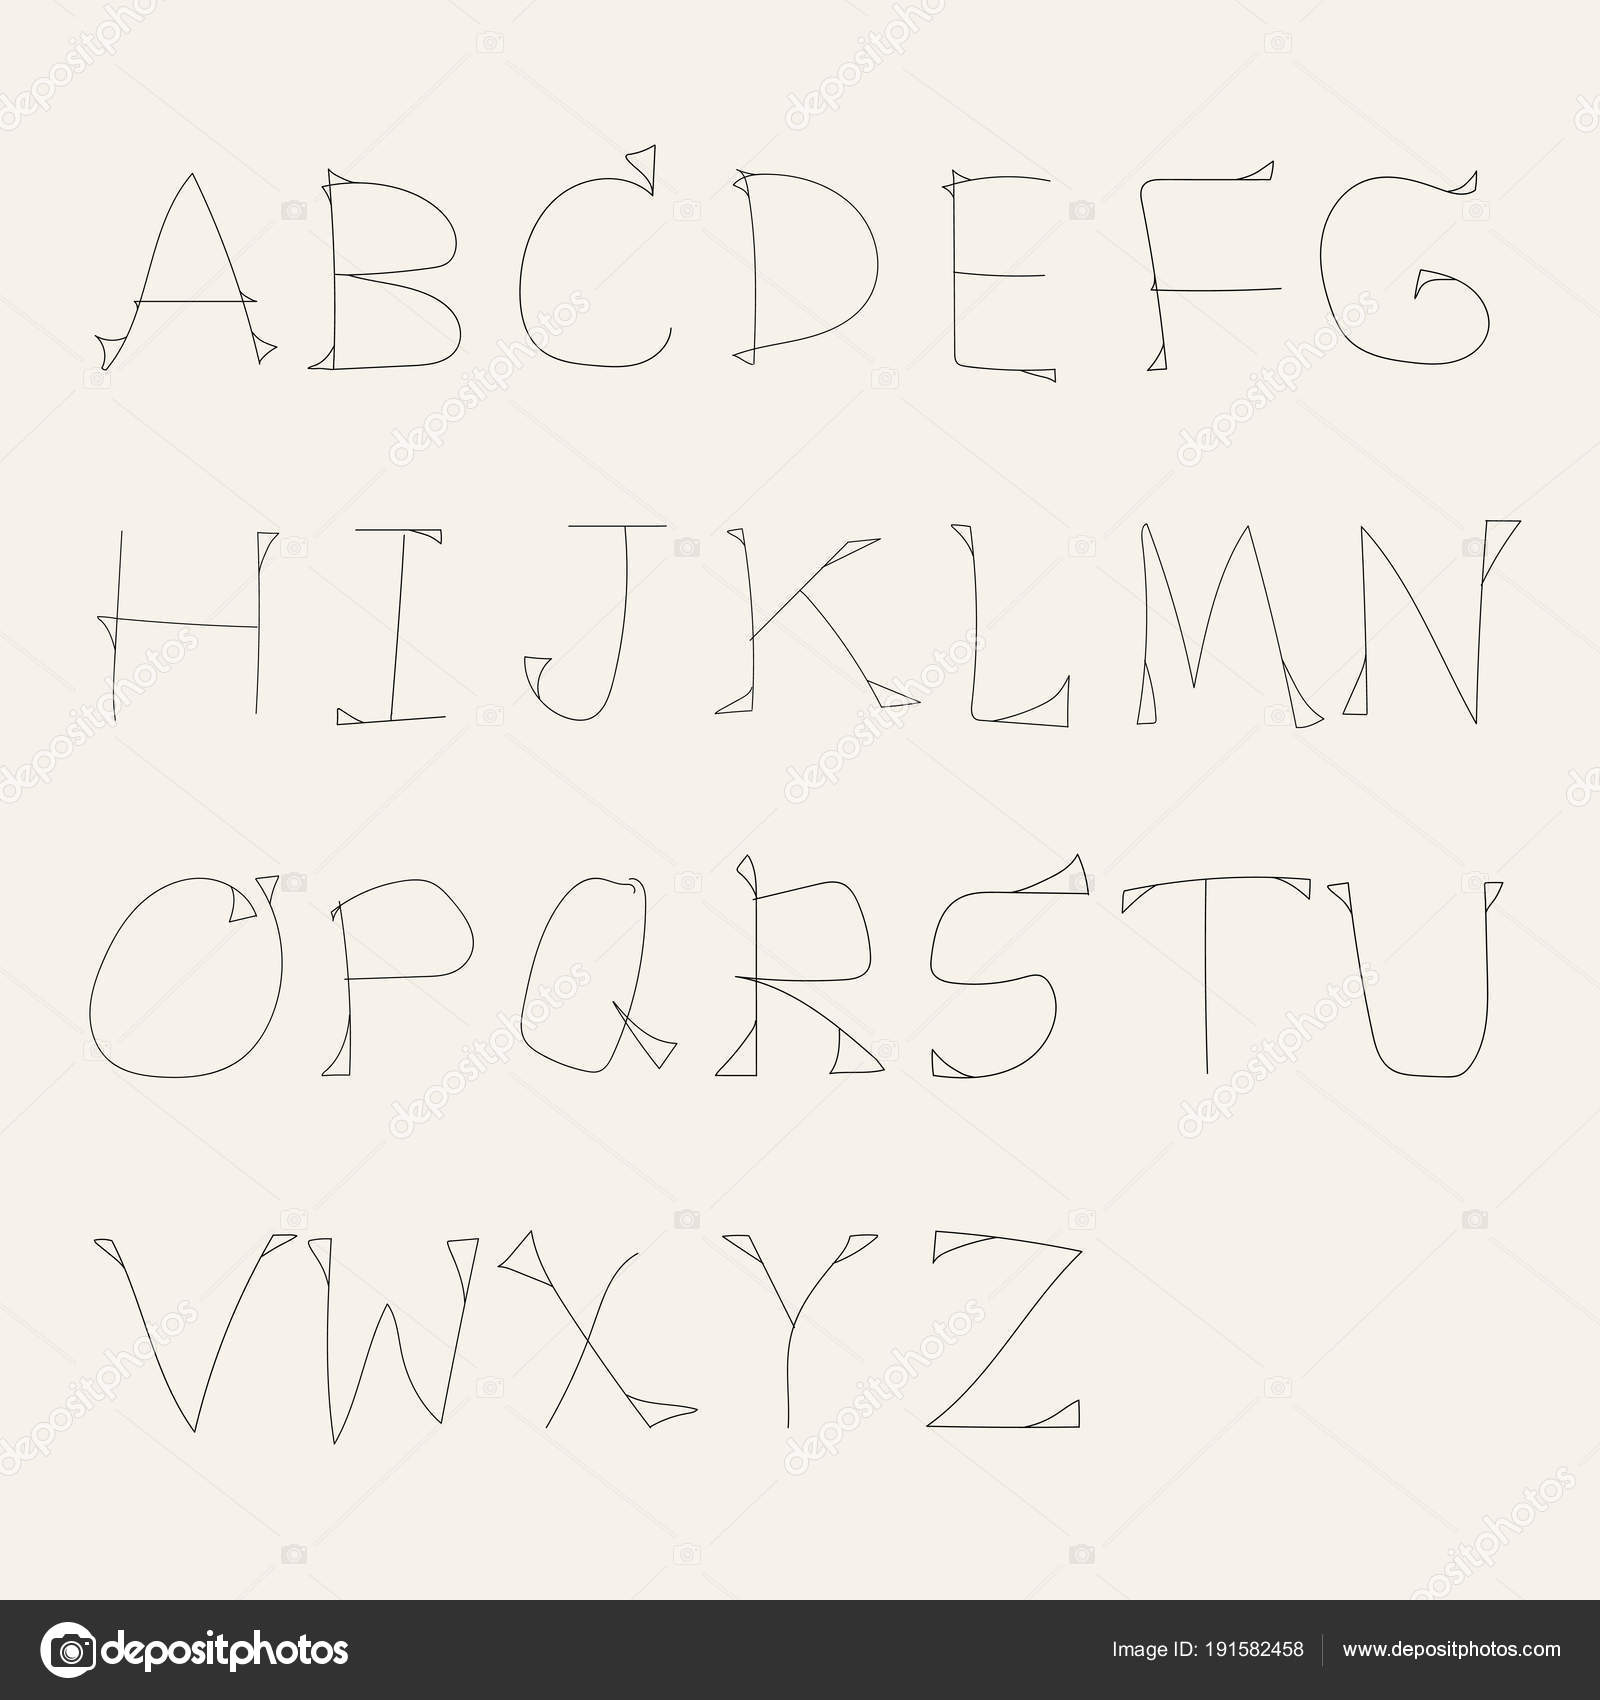 Vector Alphabet Unique Custom Characters Hand Writing Designs Illustration Eps10 Stock